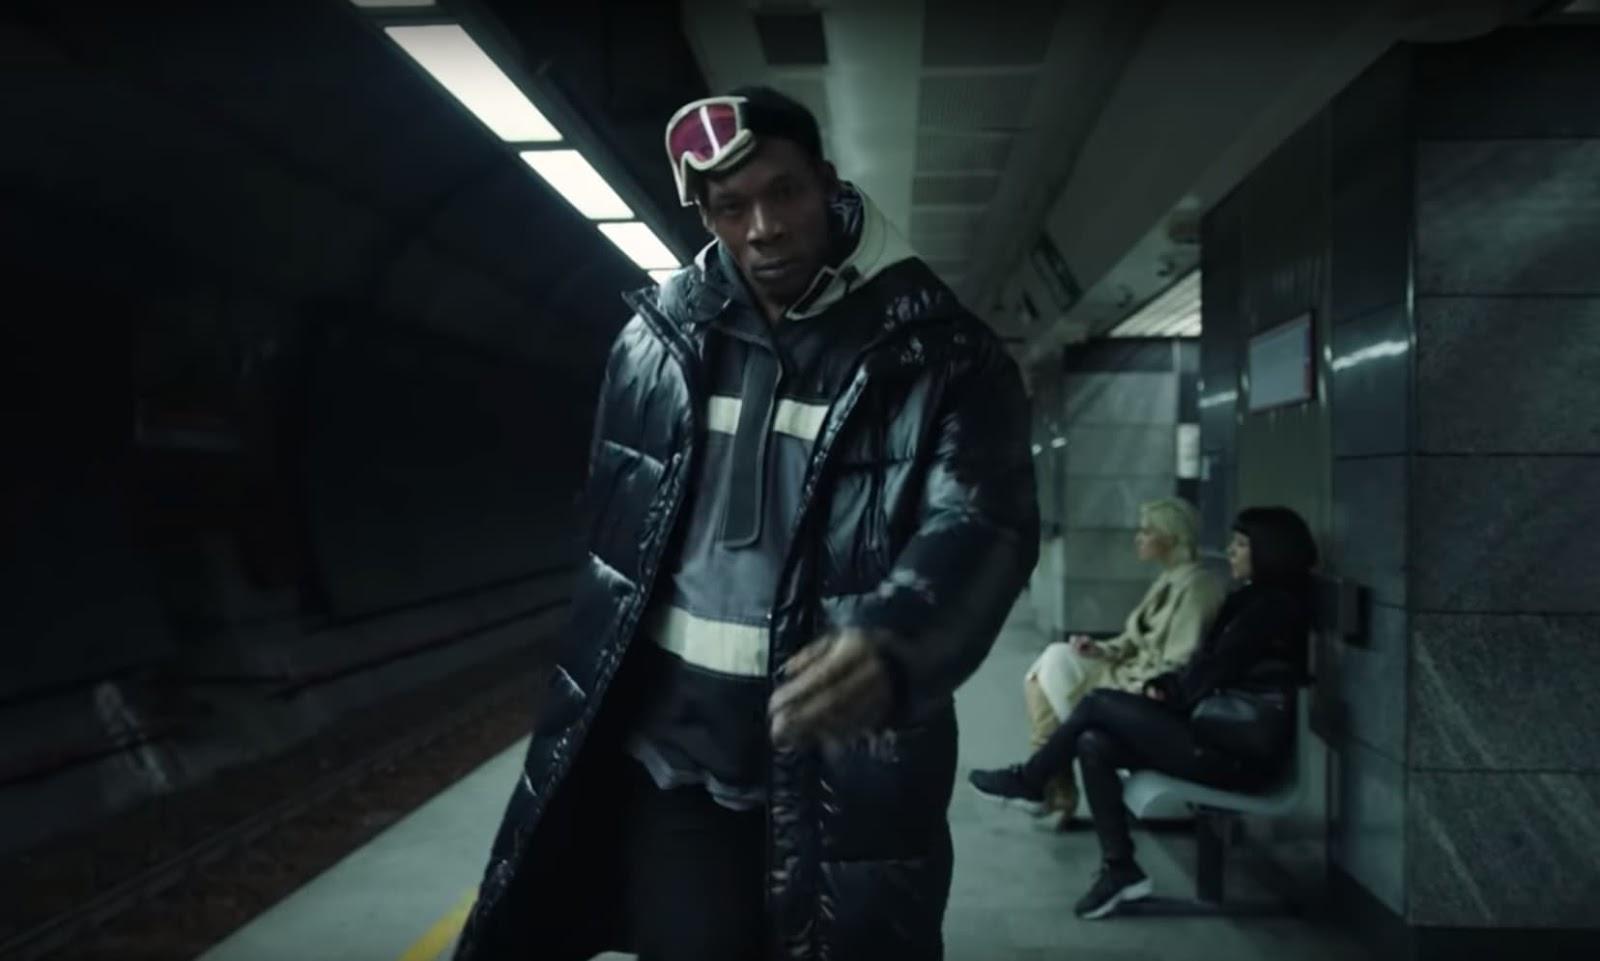 Freestyler 2019 - Bomfunk MC's | Das Musikvideo des Tages